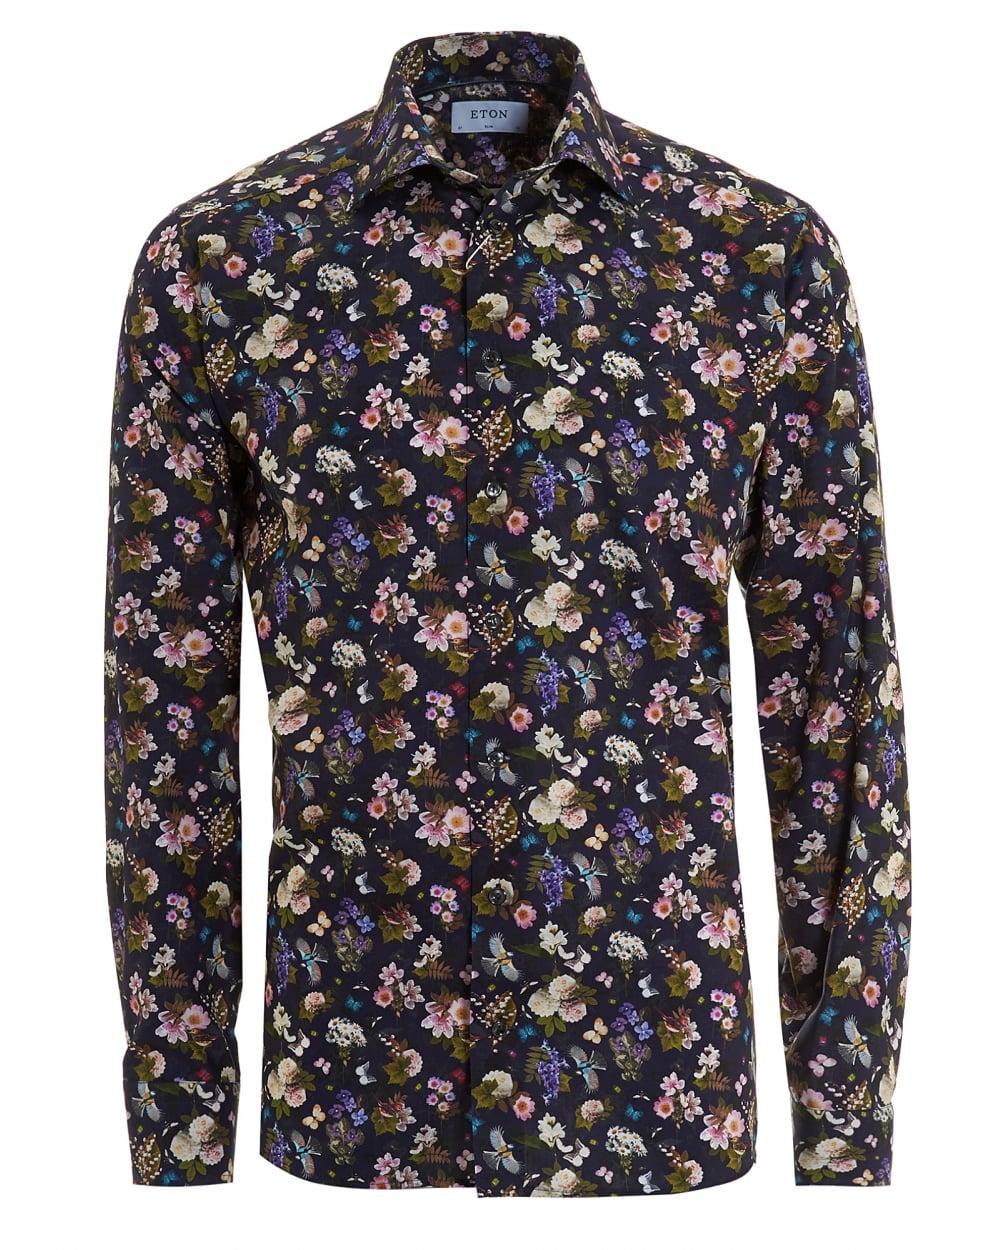 cc4c4c3e6e1 Eton Shirts Mens Swedish Floral Print Slim Fit Navy Blue Shirt